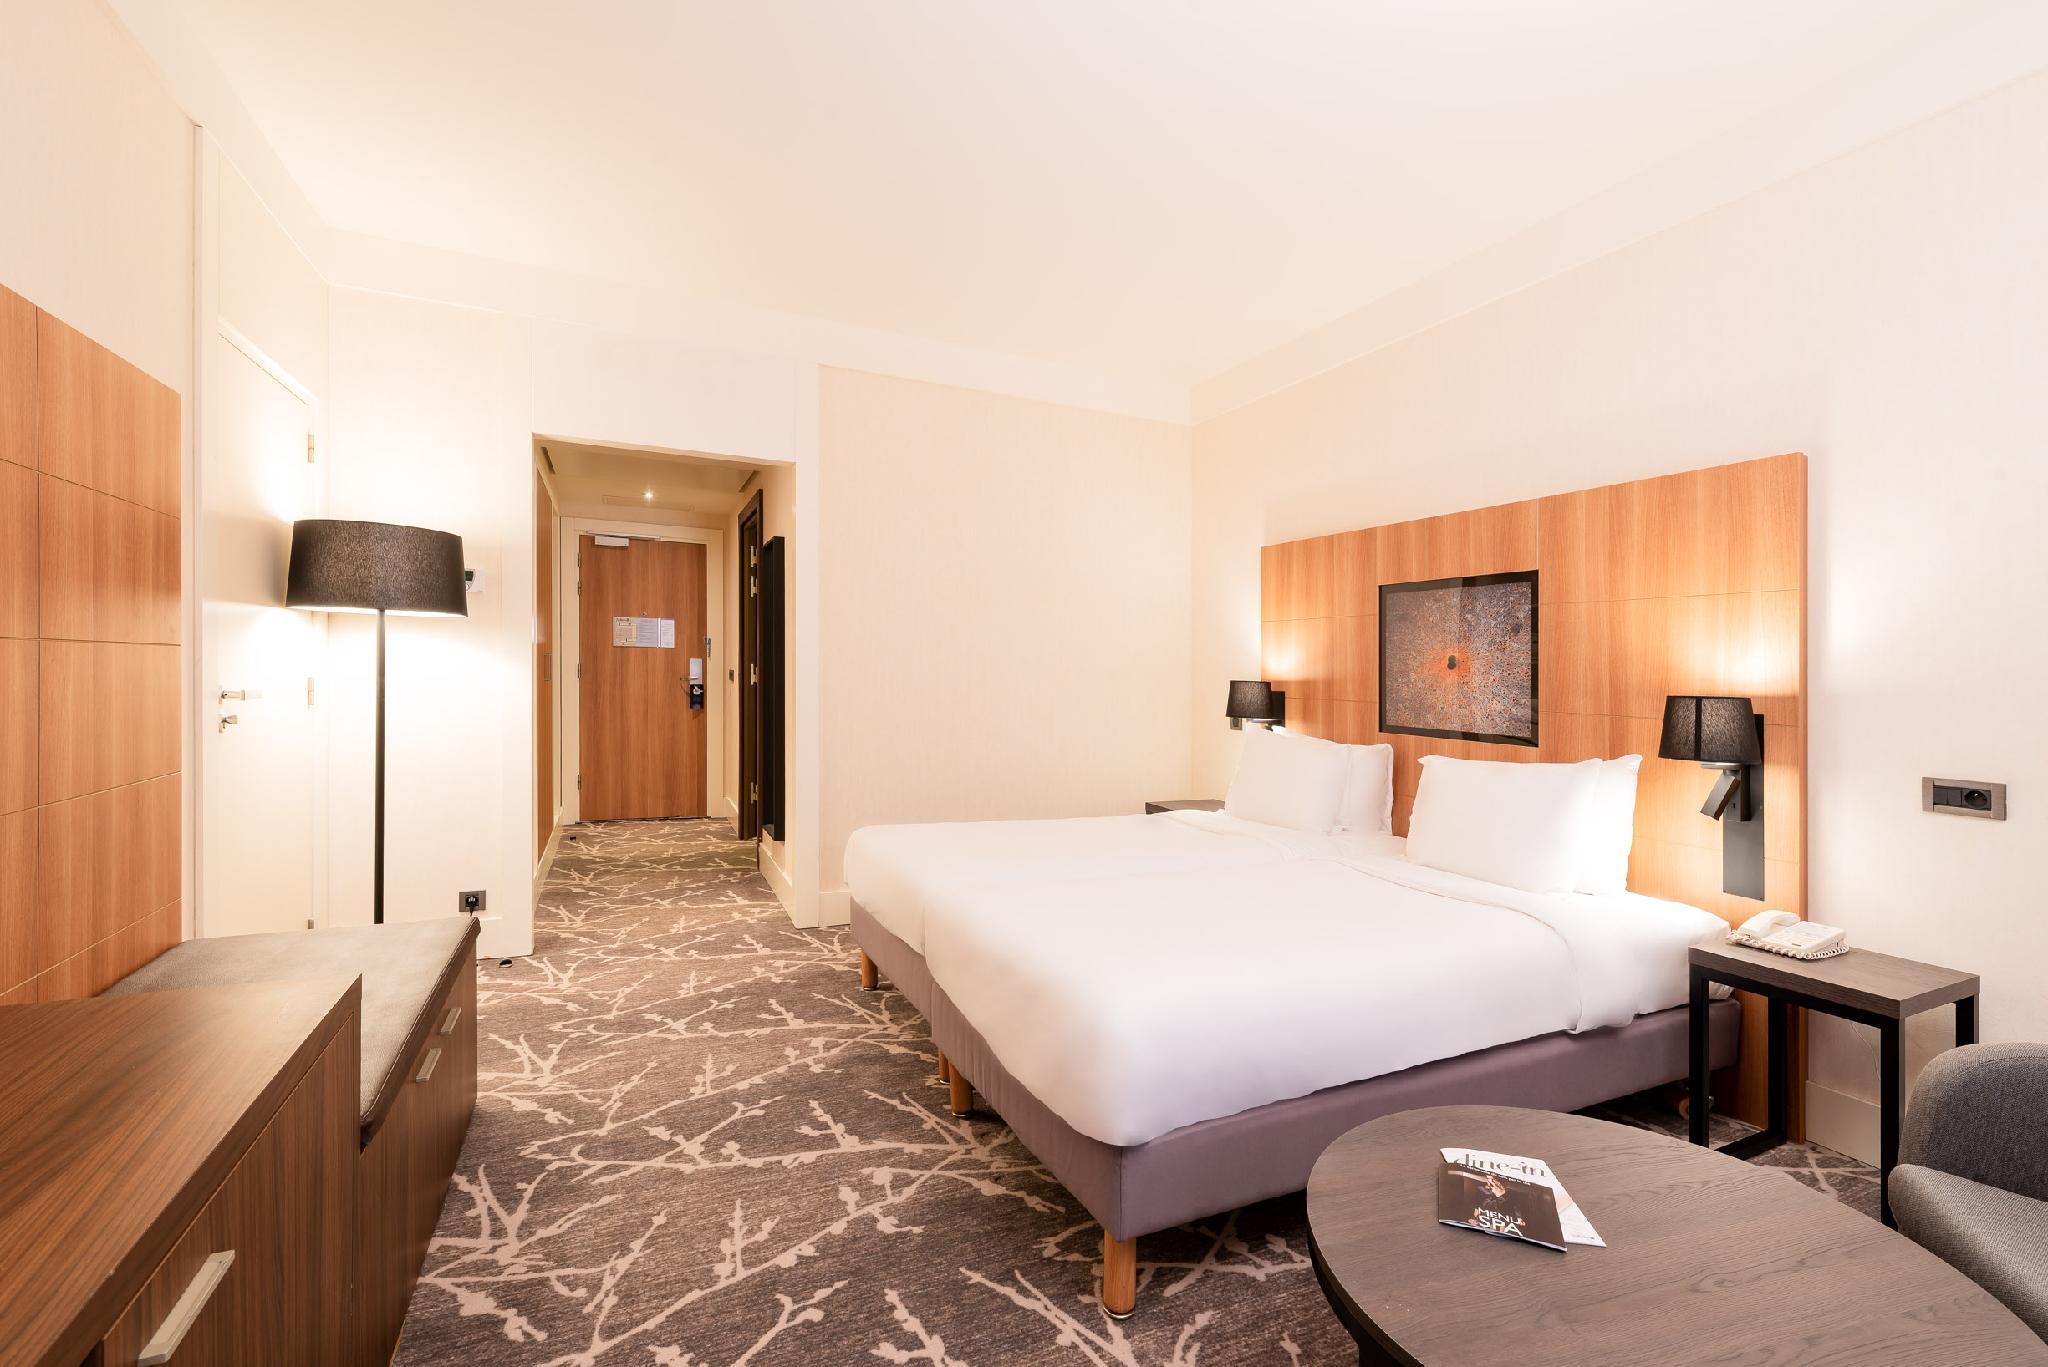 Radisson Blu Hotel Paris Marne La Vallee